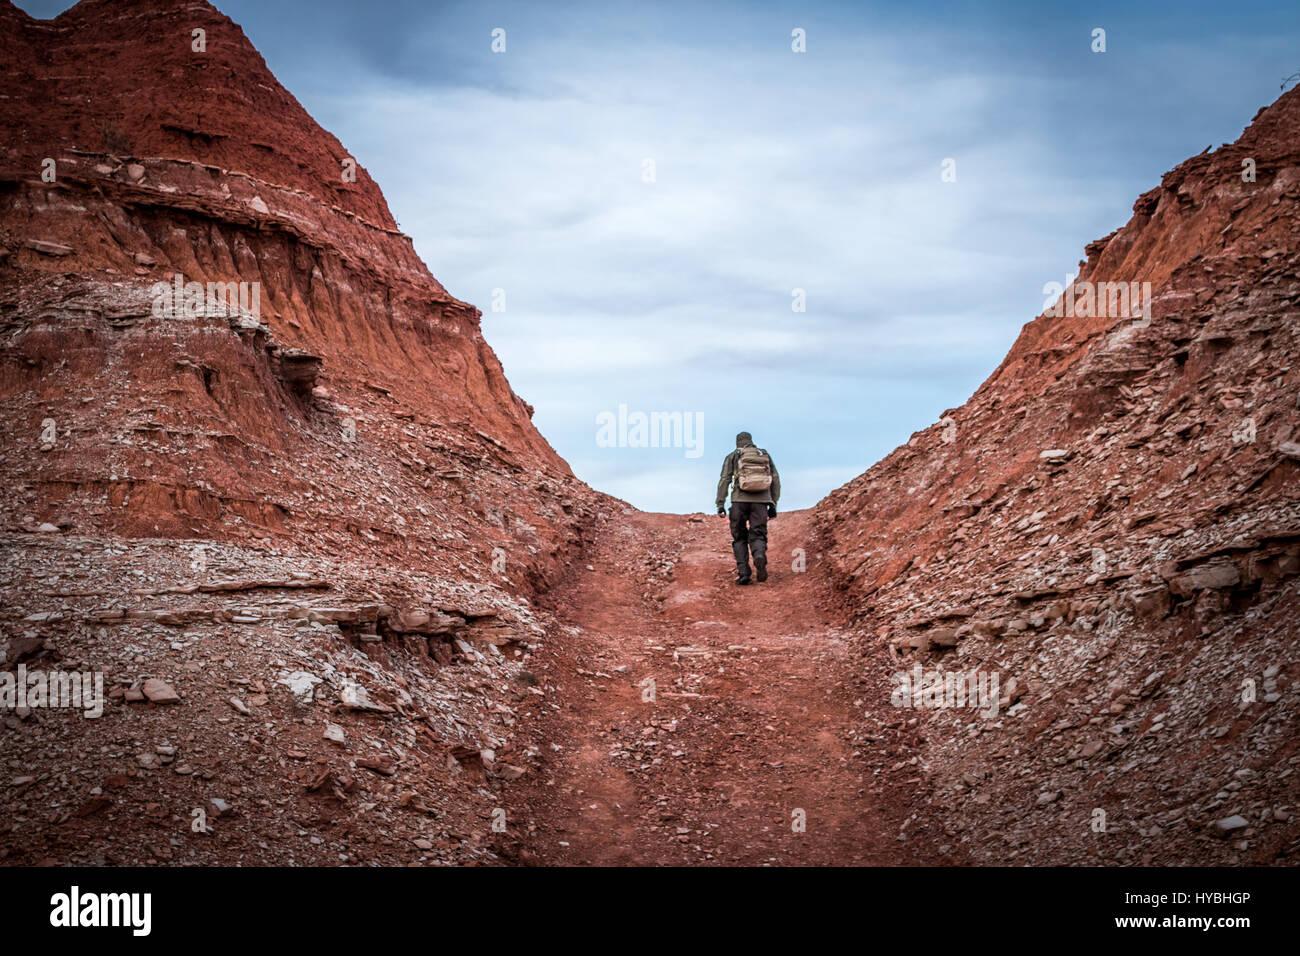 Climbing a Hill - Stock Image